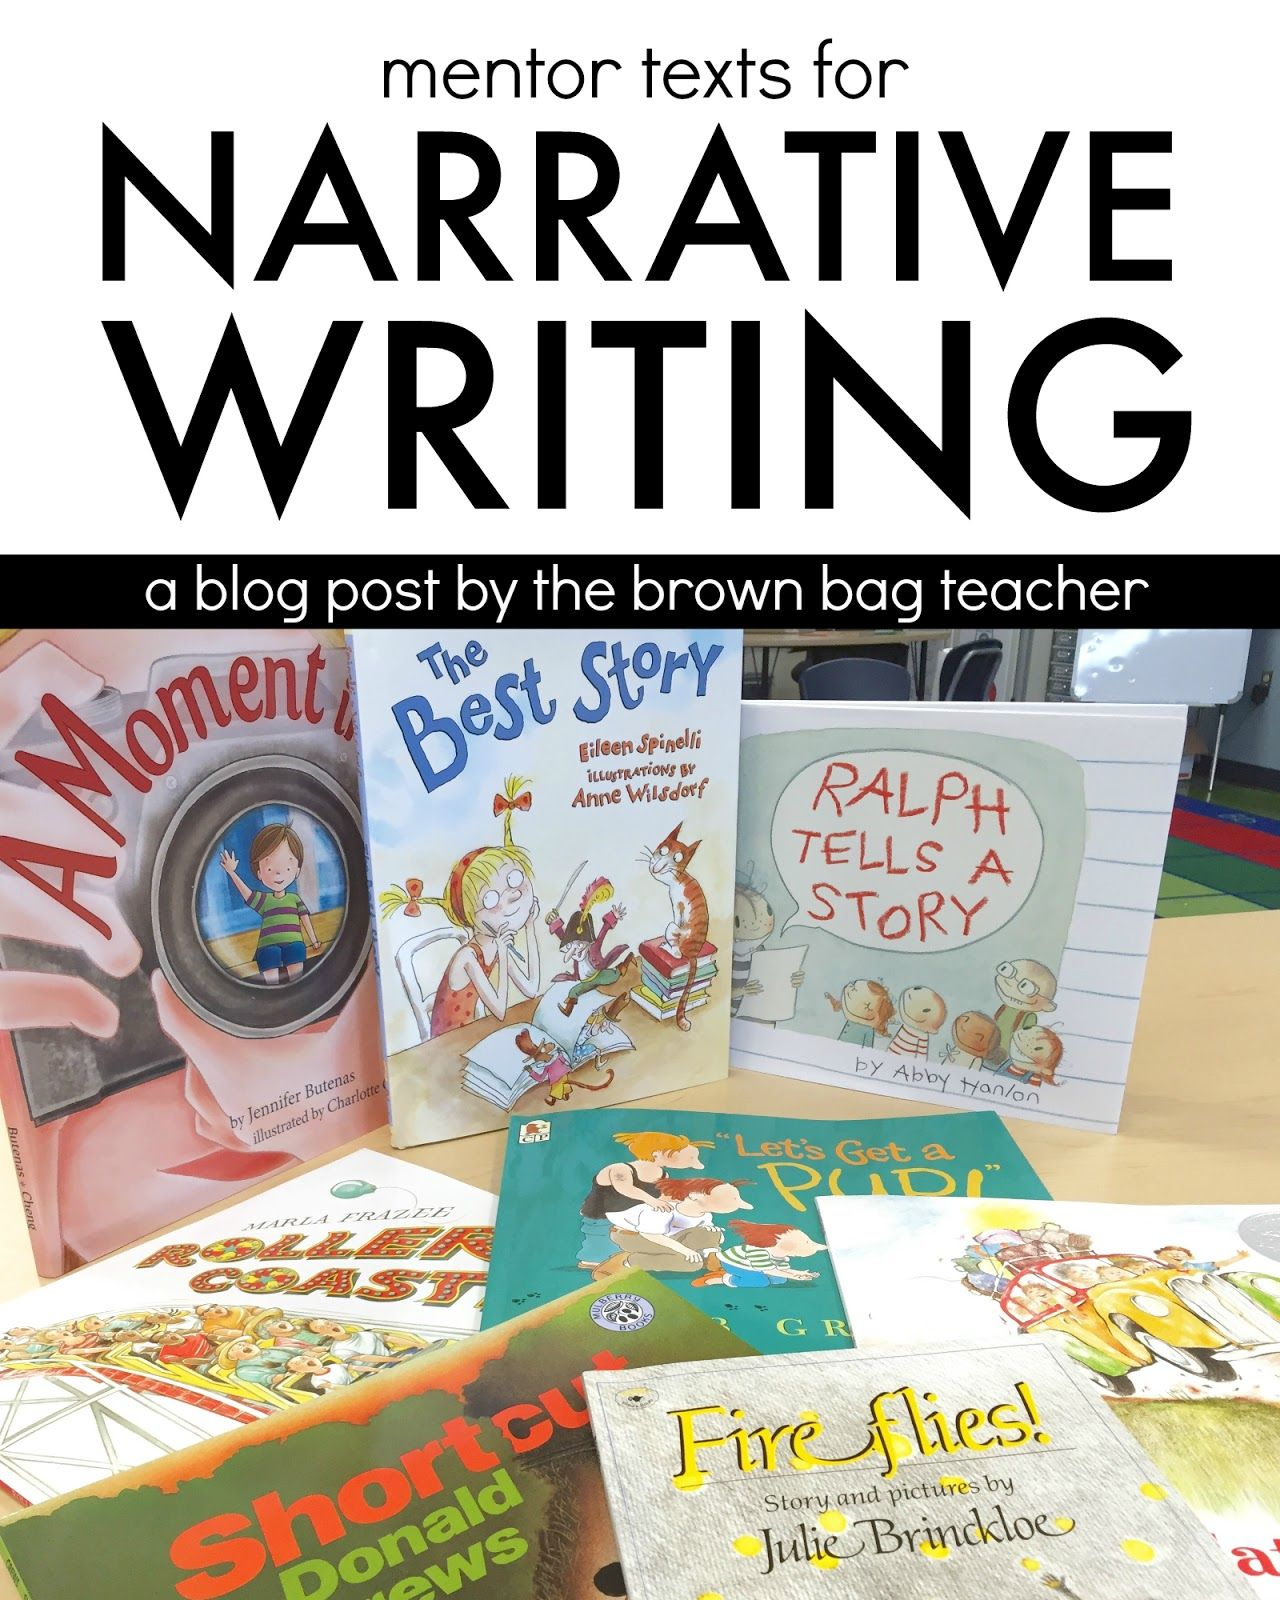 Narrative Writing Mentor Texts | Writing | Writing mentor texts